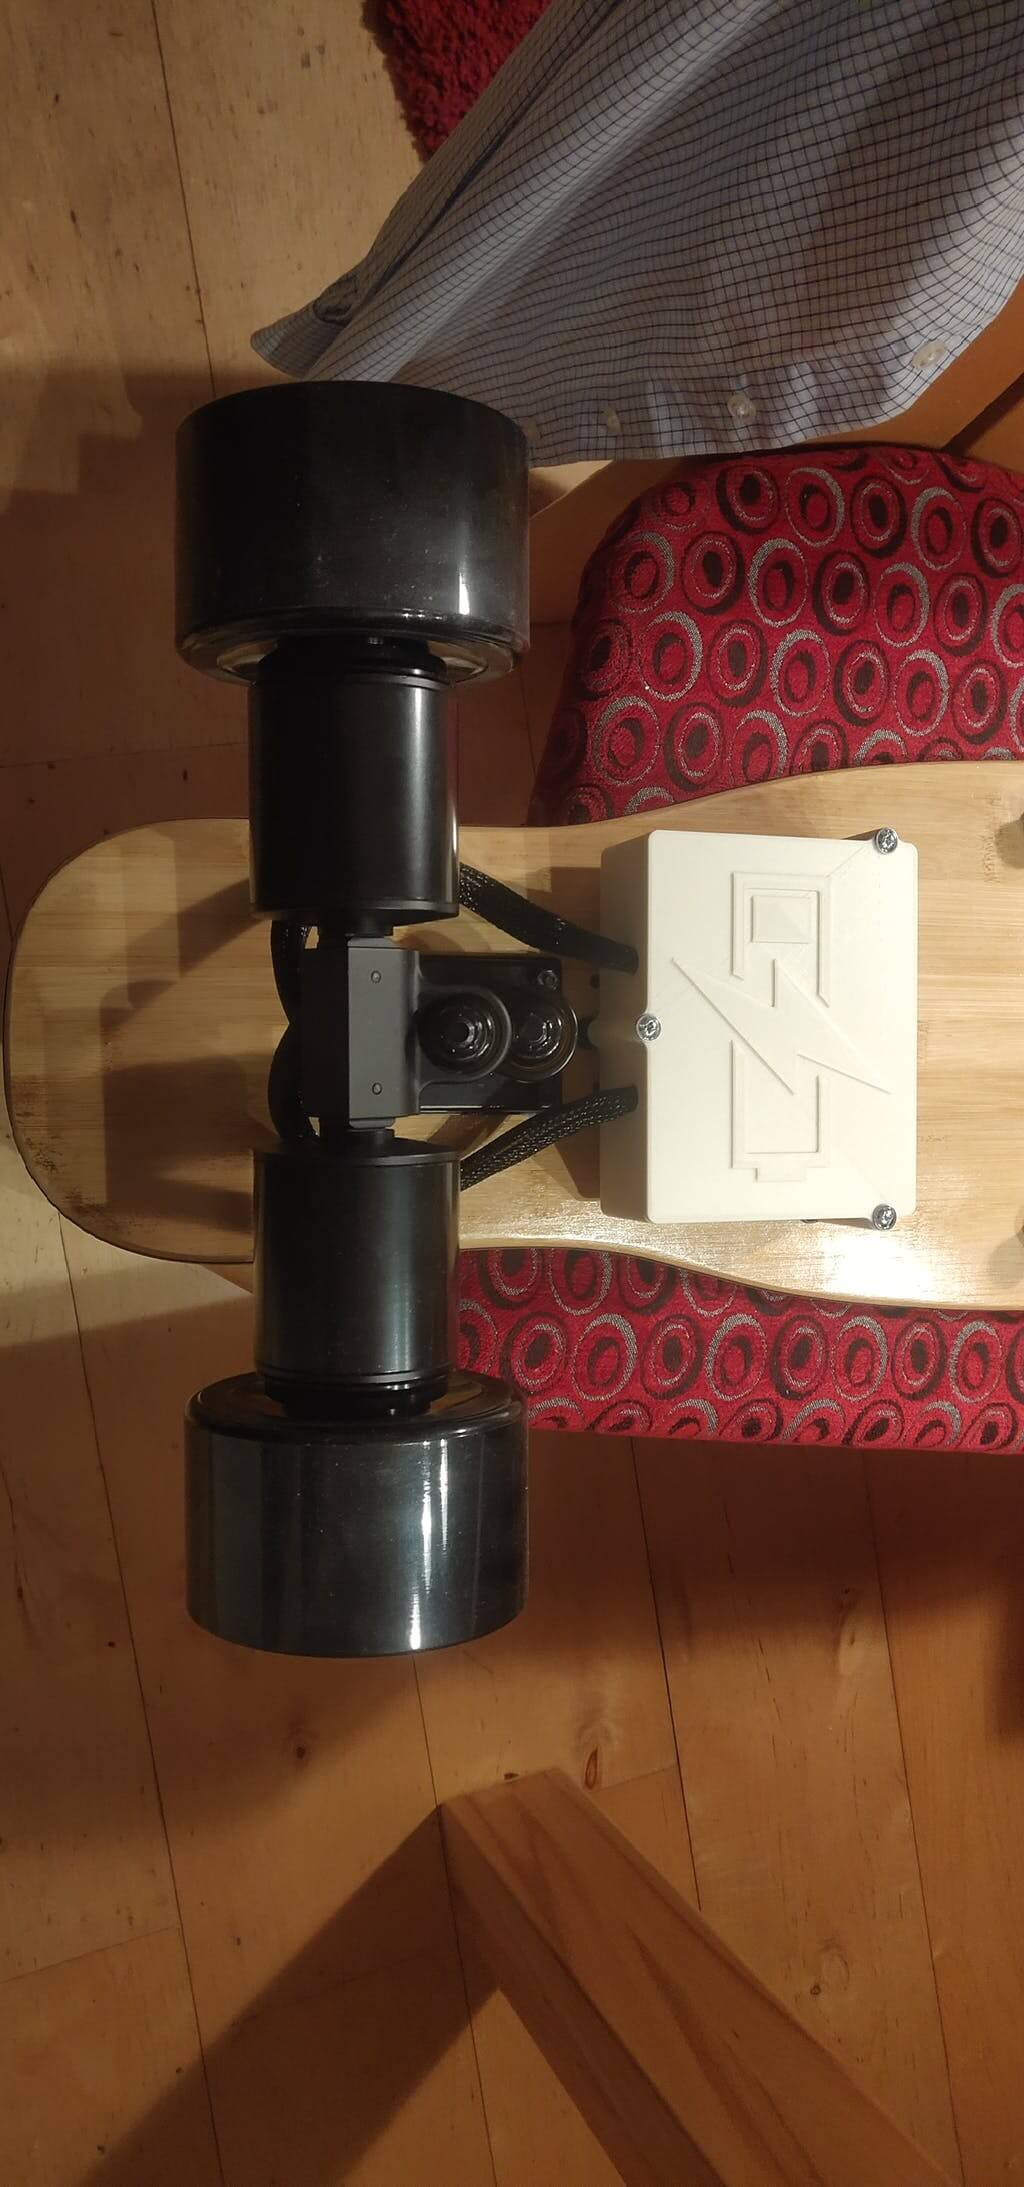 Direct drive motor kit-boundmotor (3)